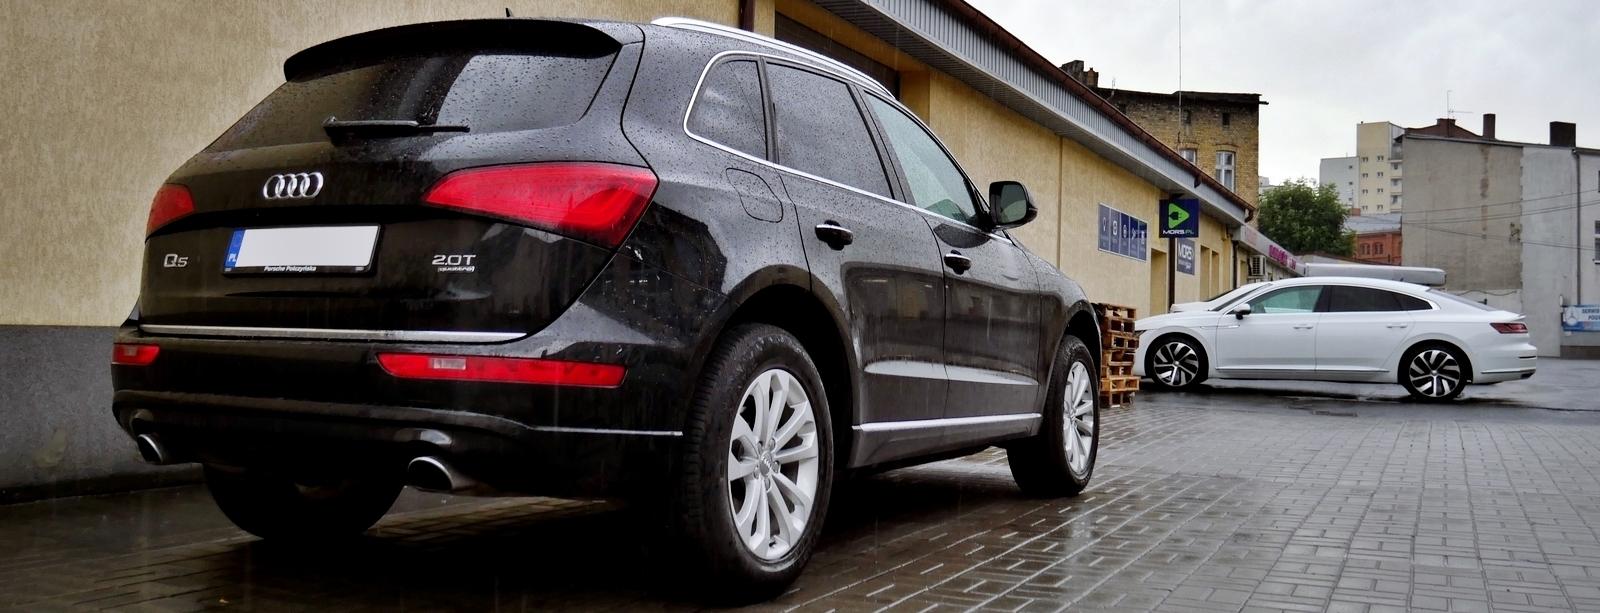 Audi Q5 Maxhaust